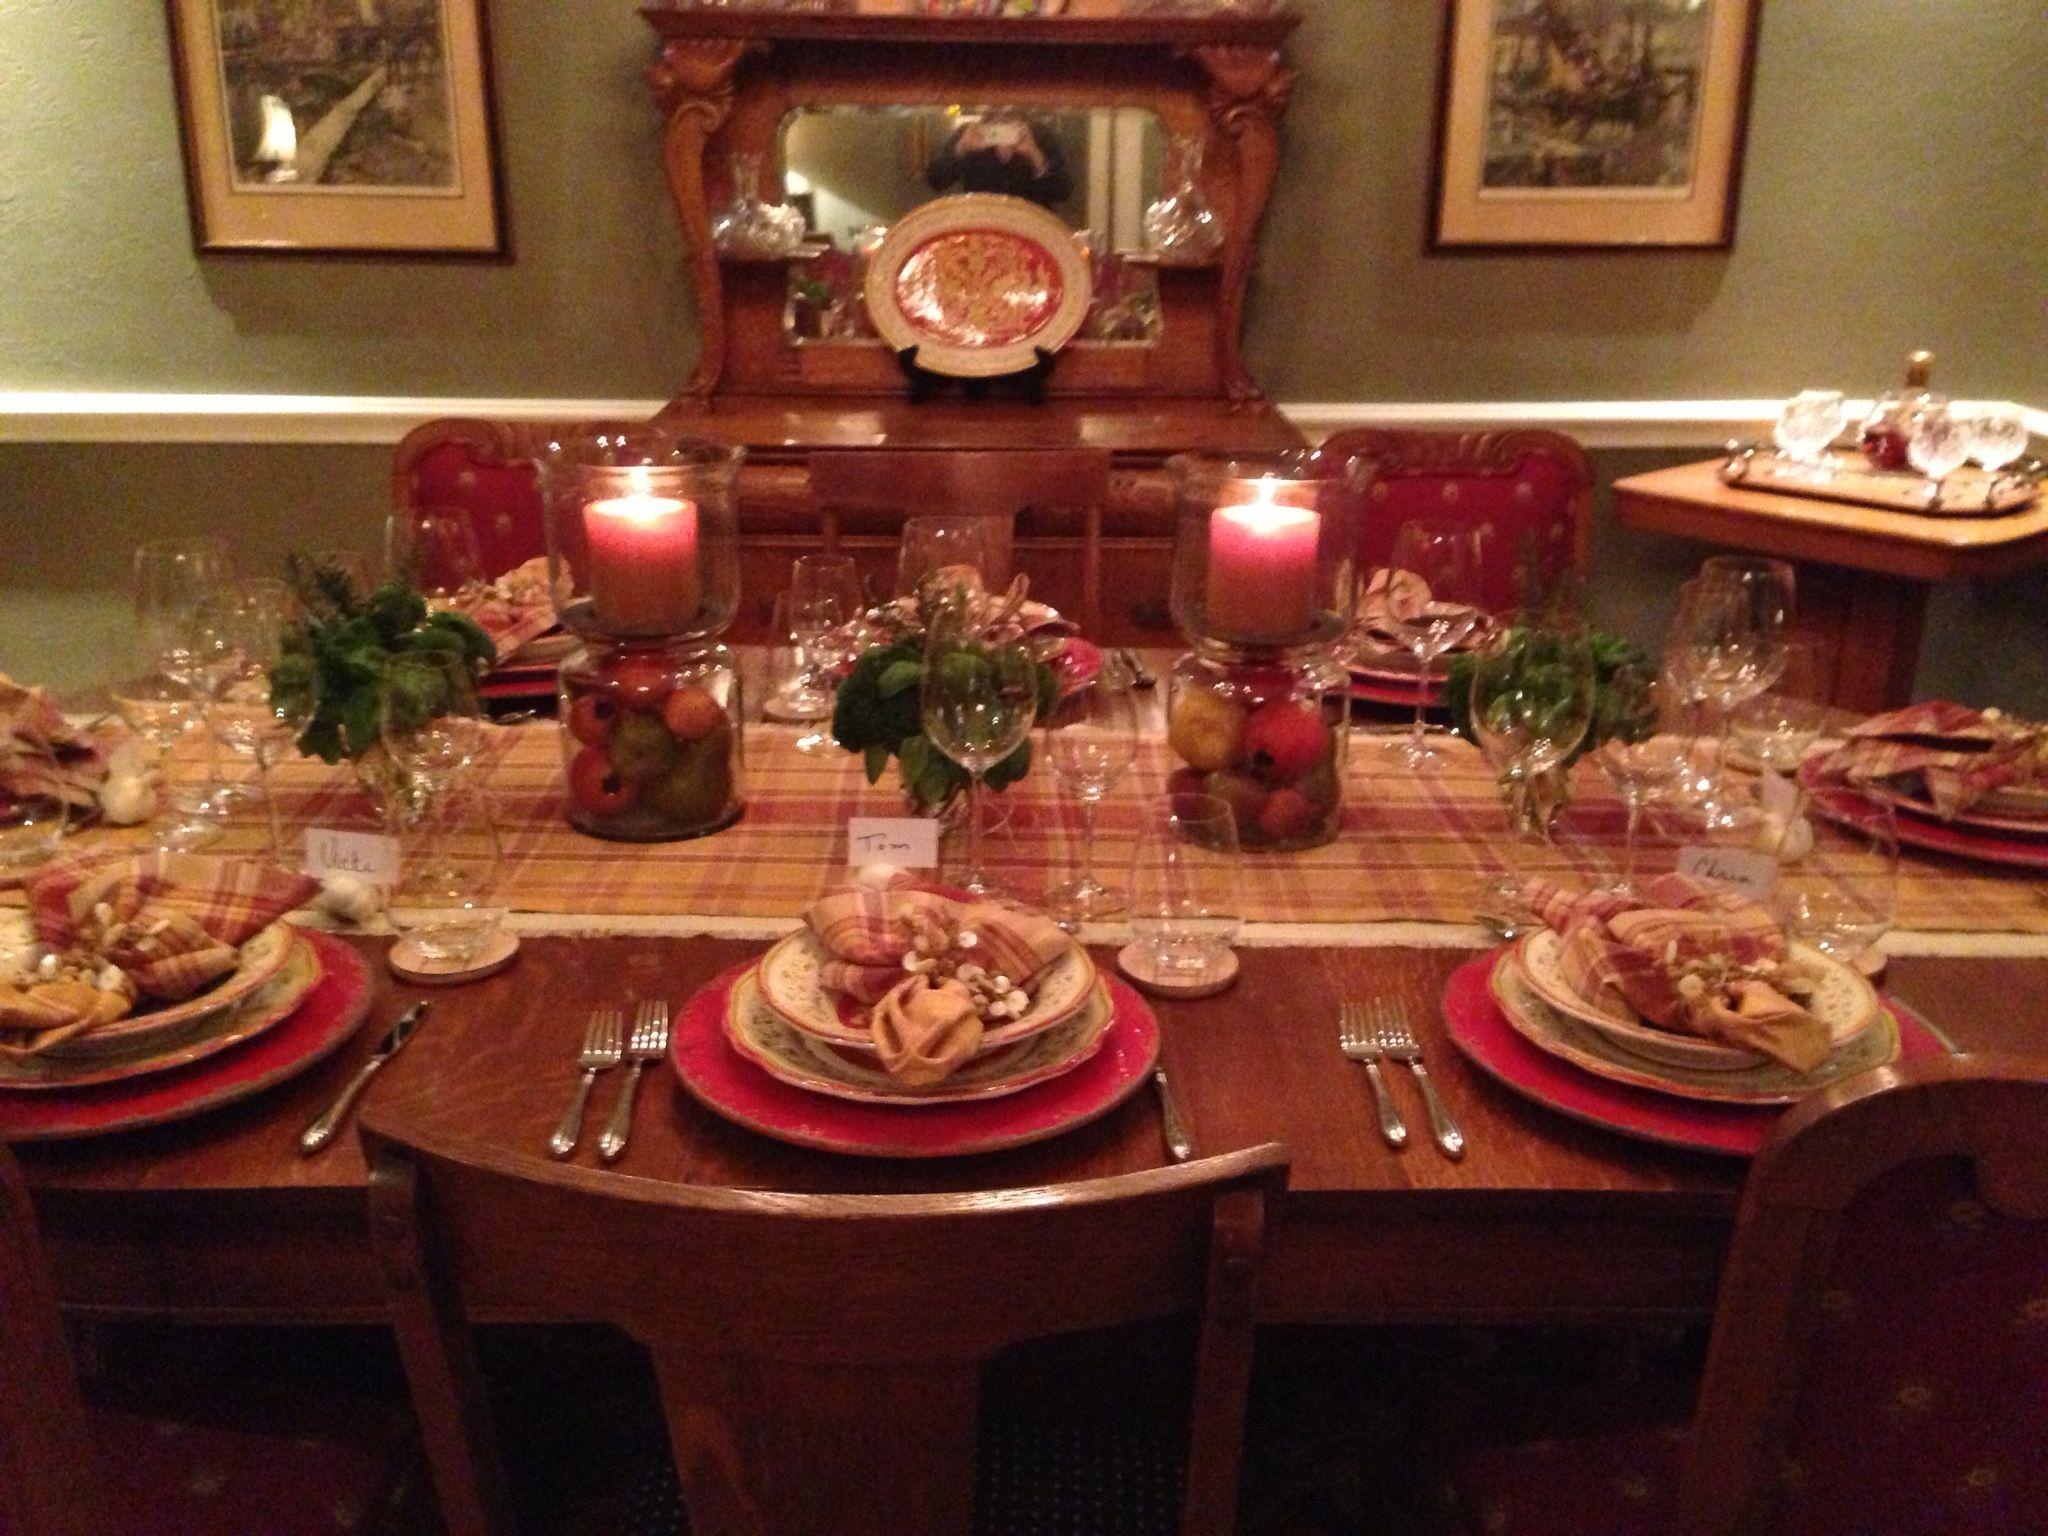 Italian Table Setting Italian Dinner Table Setting Tablescapes Pinterest Italian